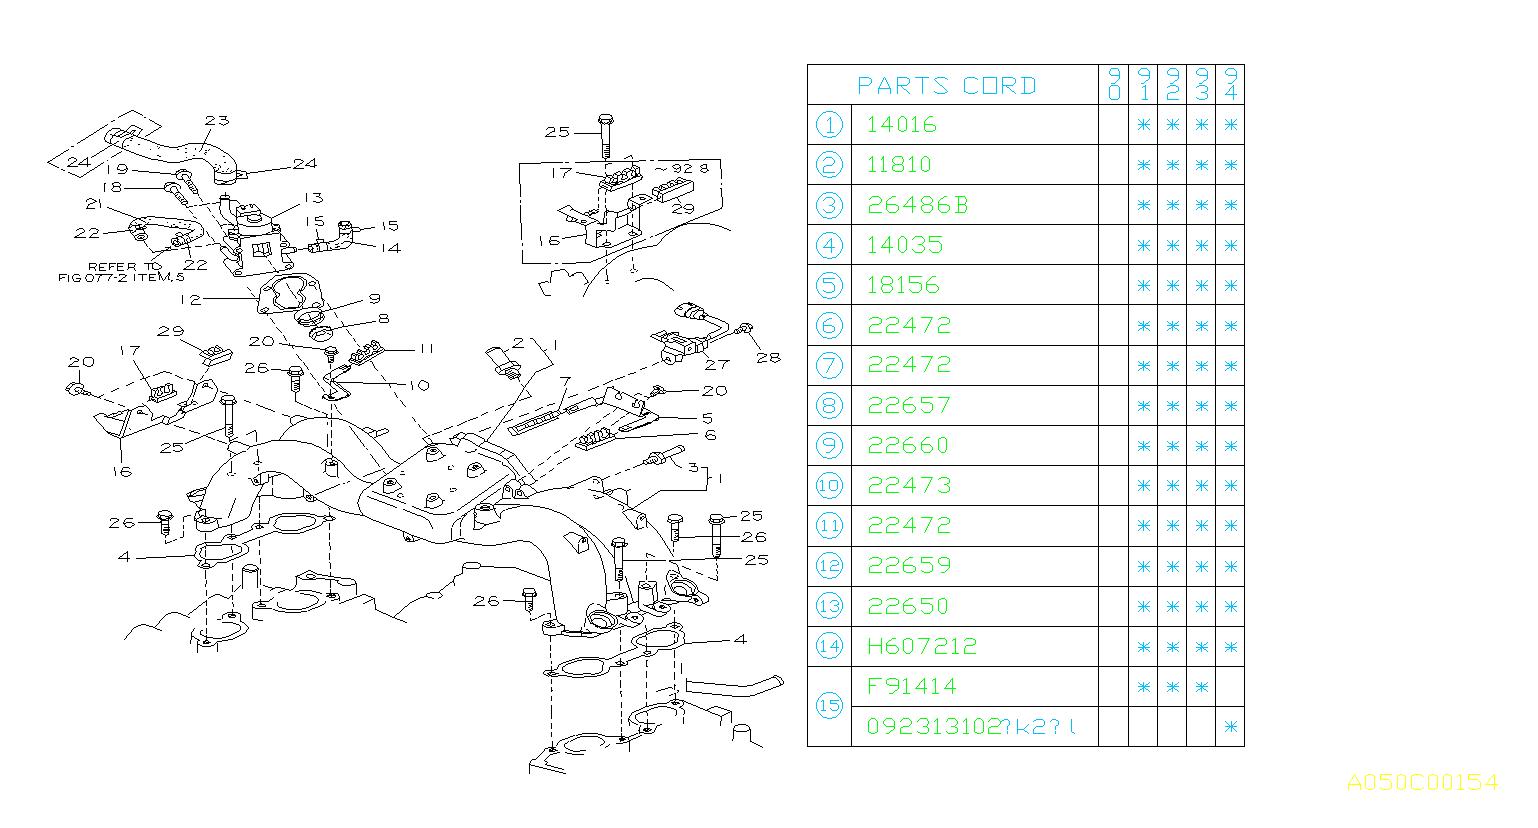 22650AA034  Valve assemblyair control Manifold  intake